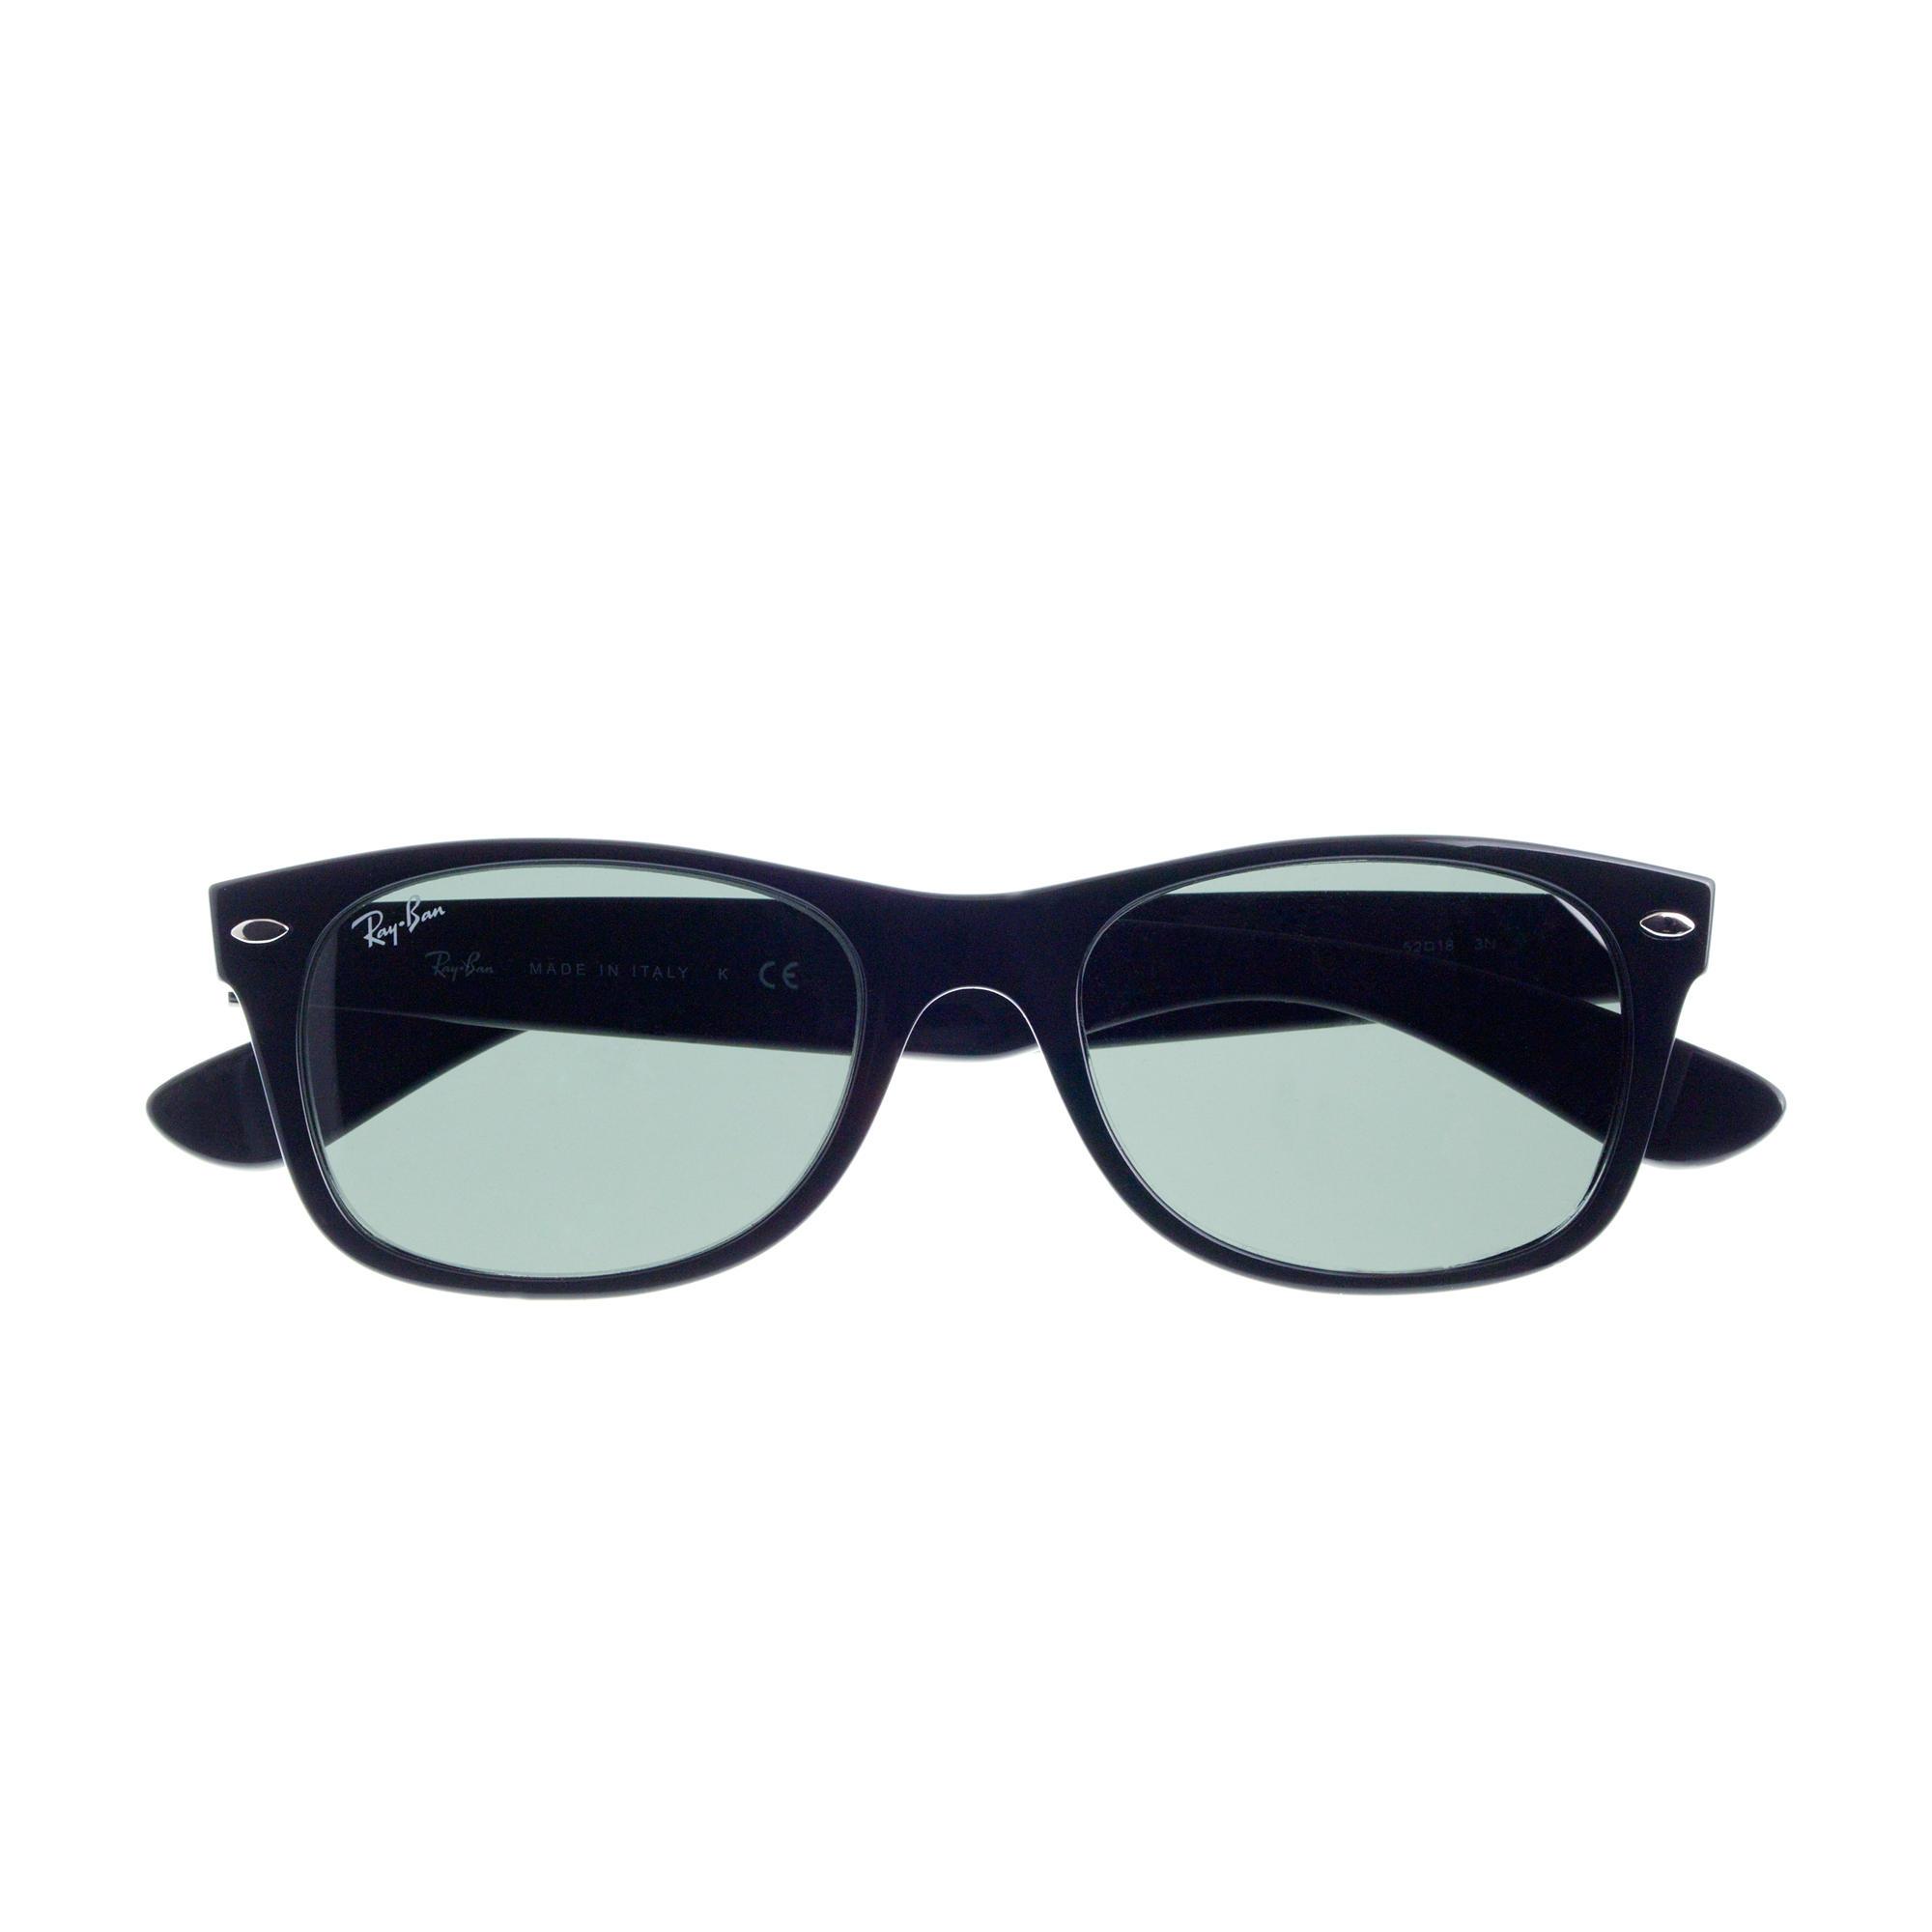 53e9f24116a J.Crew Ray-ban New Wayfarer Sunglasses in Black for Men - Lyst